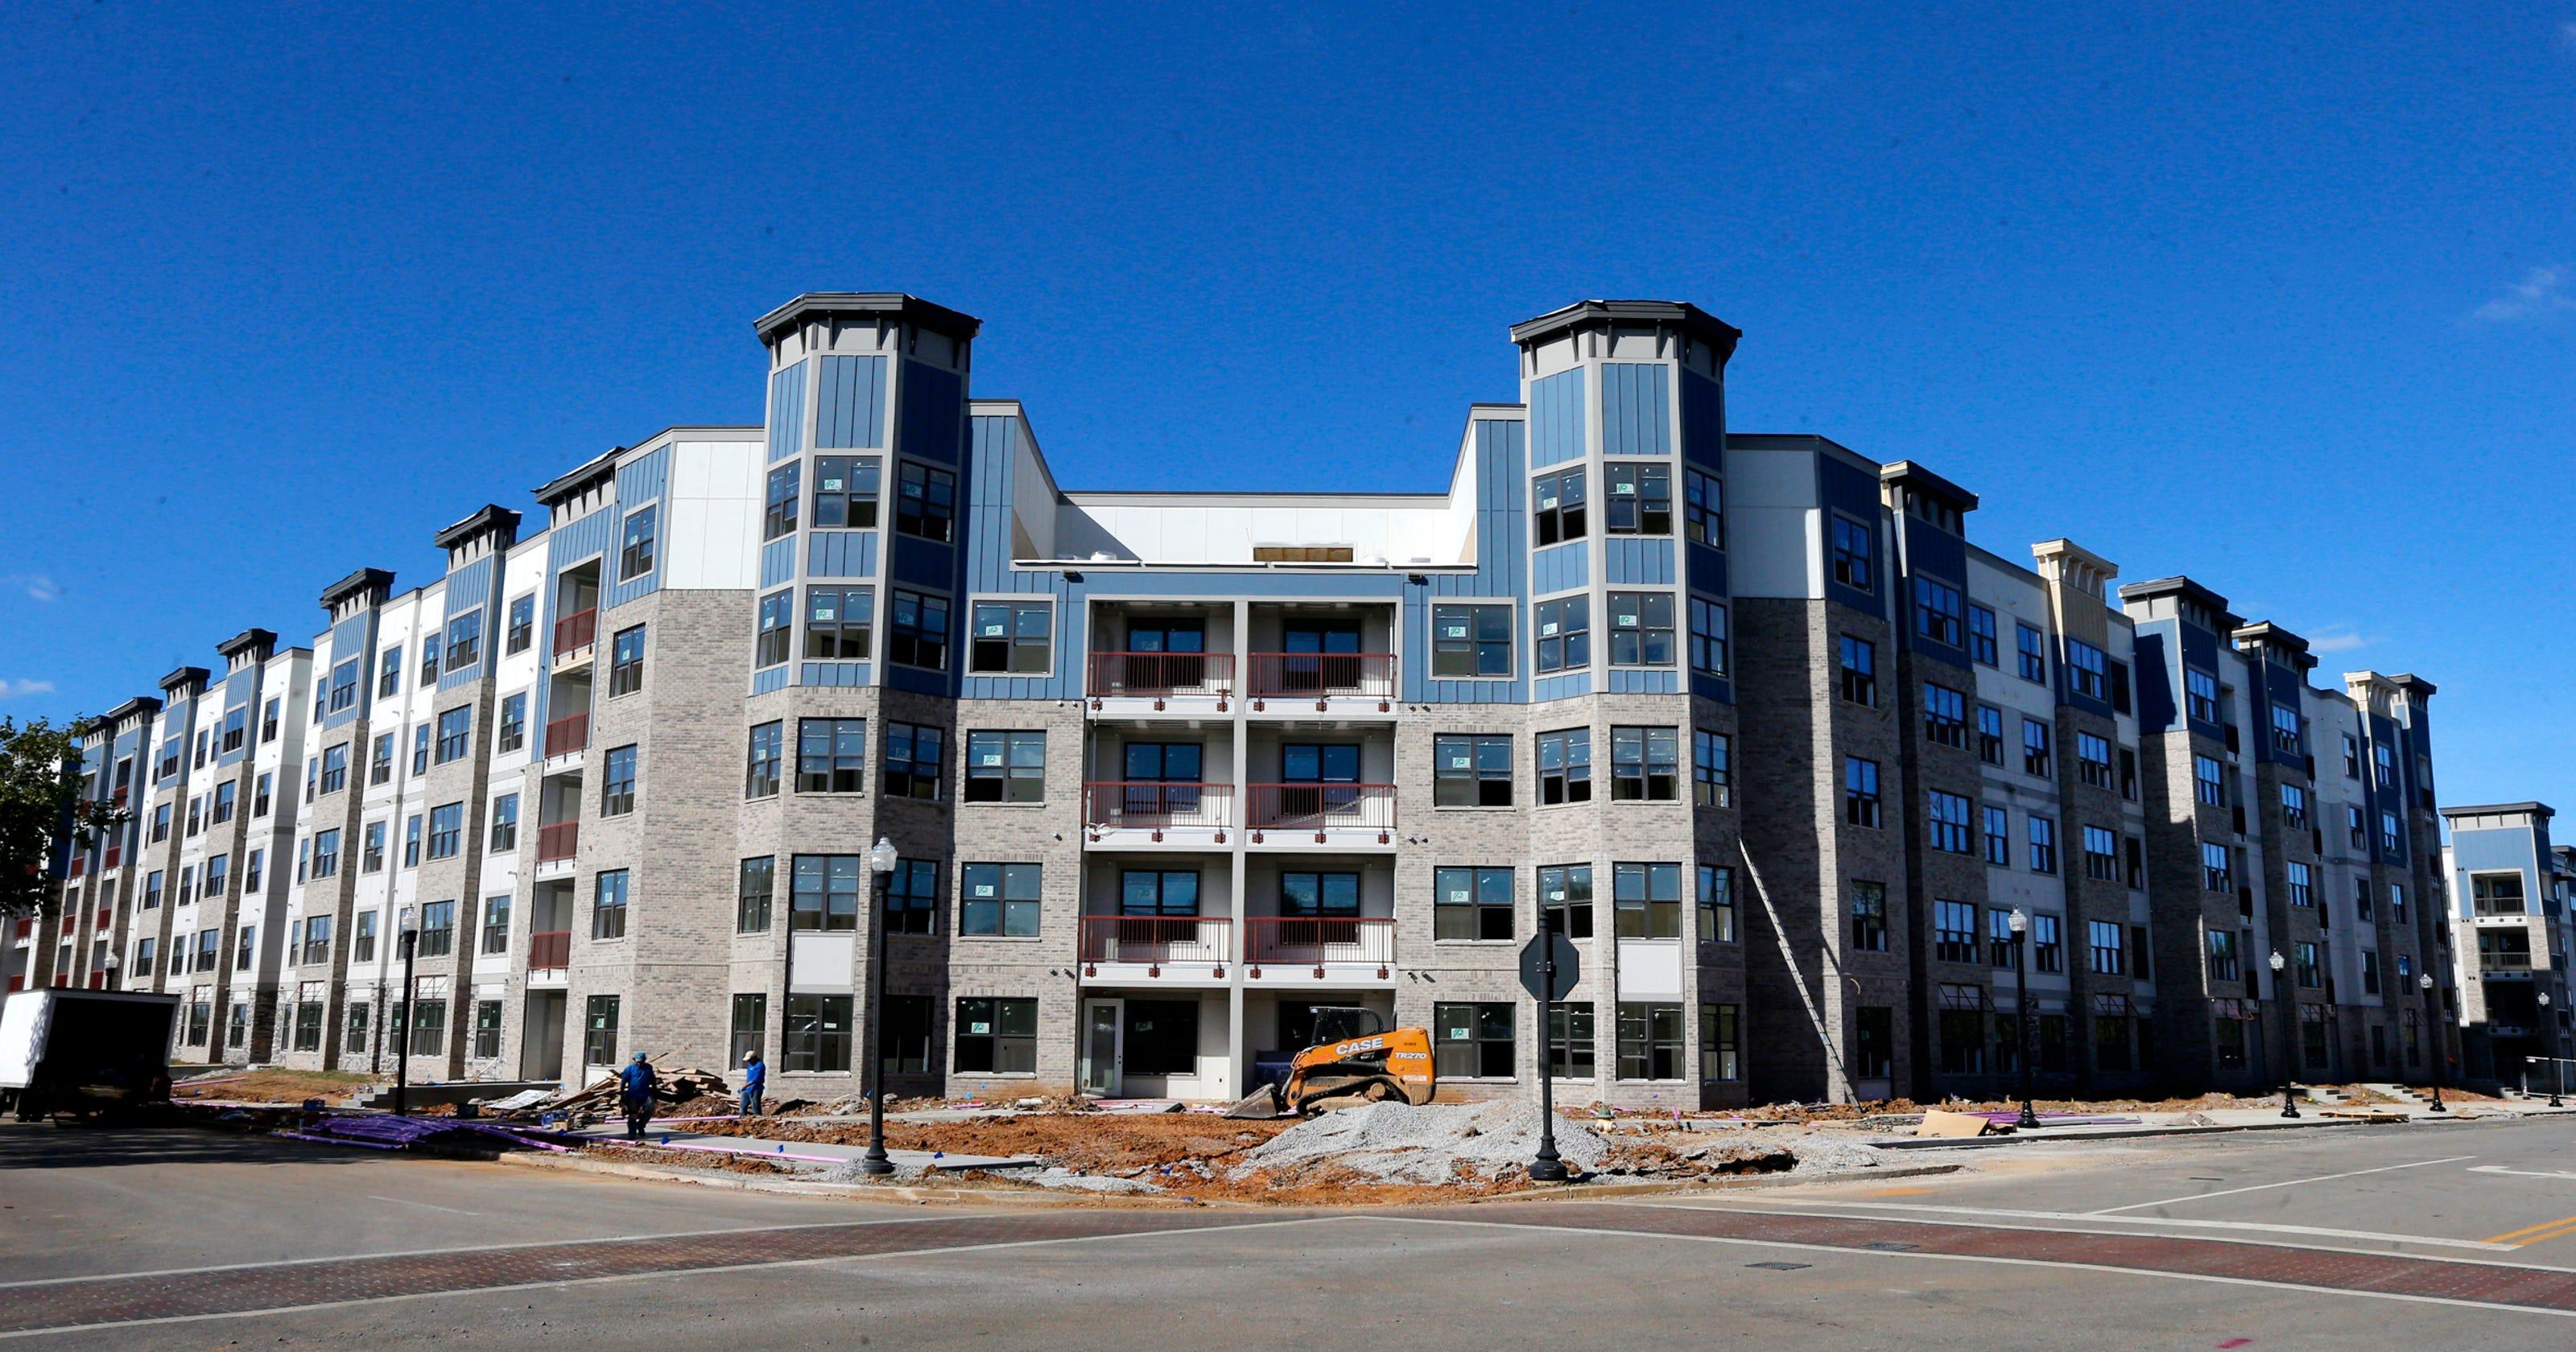 New Murfreesboro Gateway Apartment Complex Planned Near Proposed Krispy Kreme